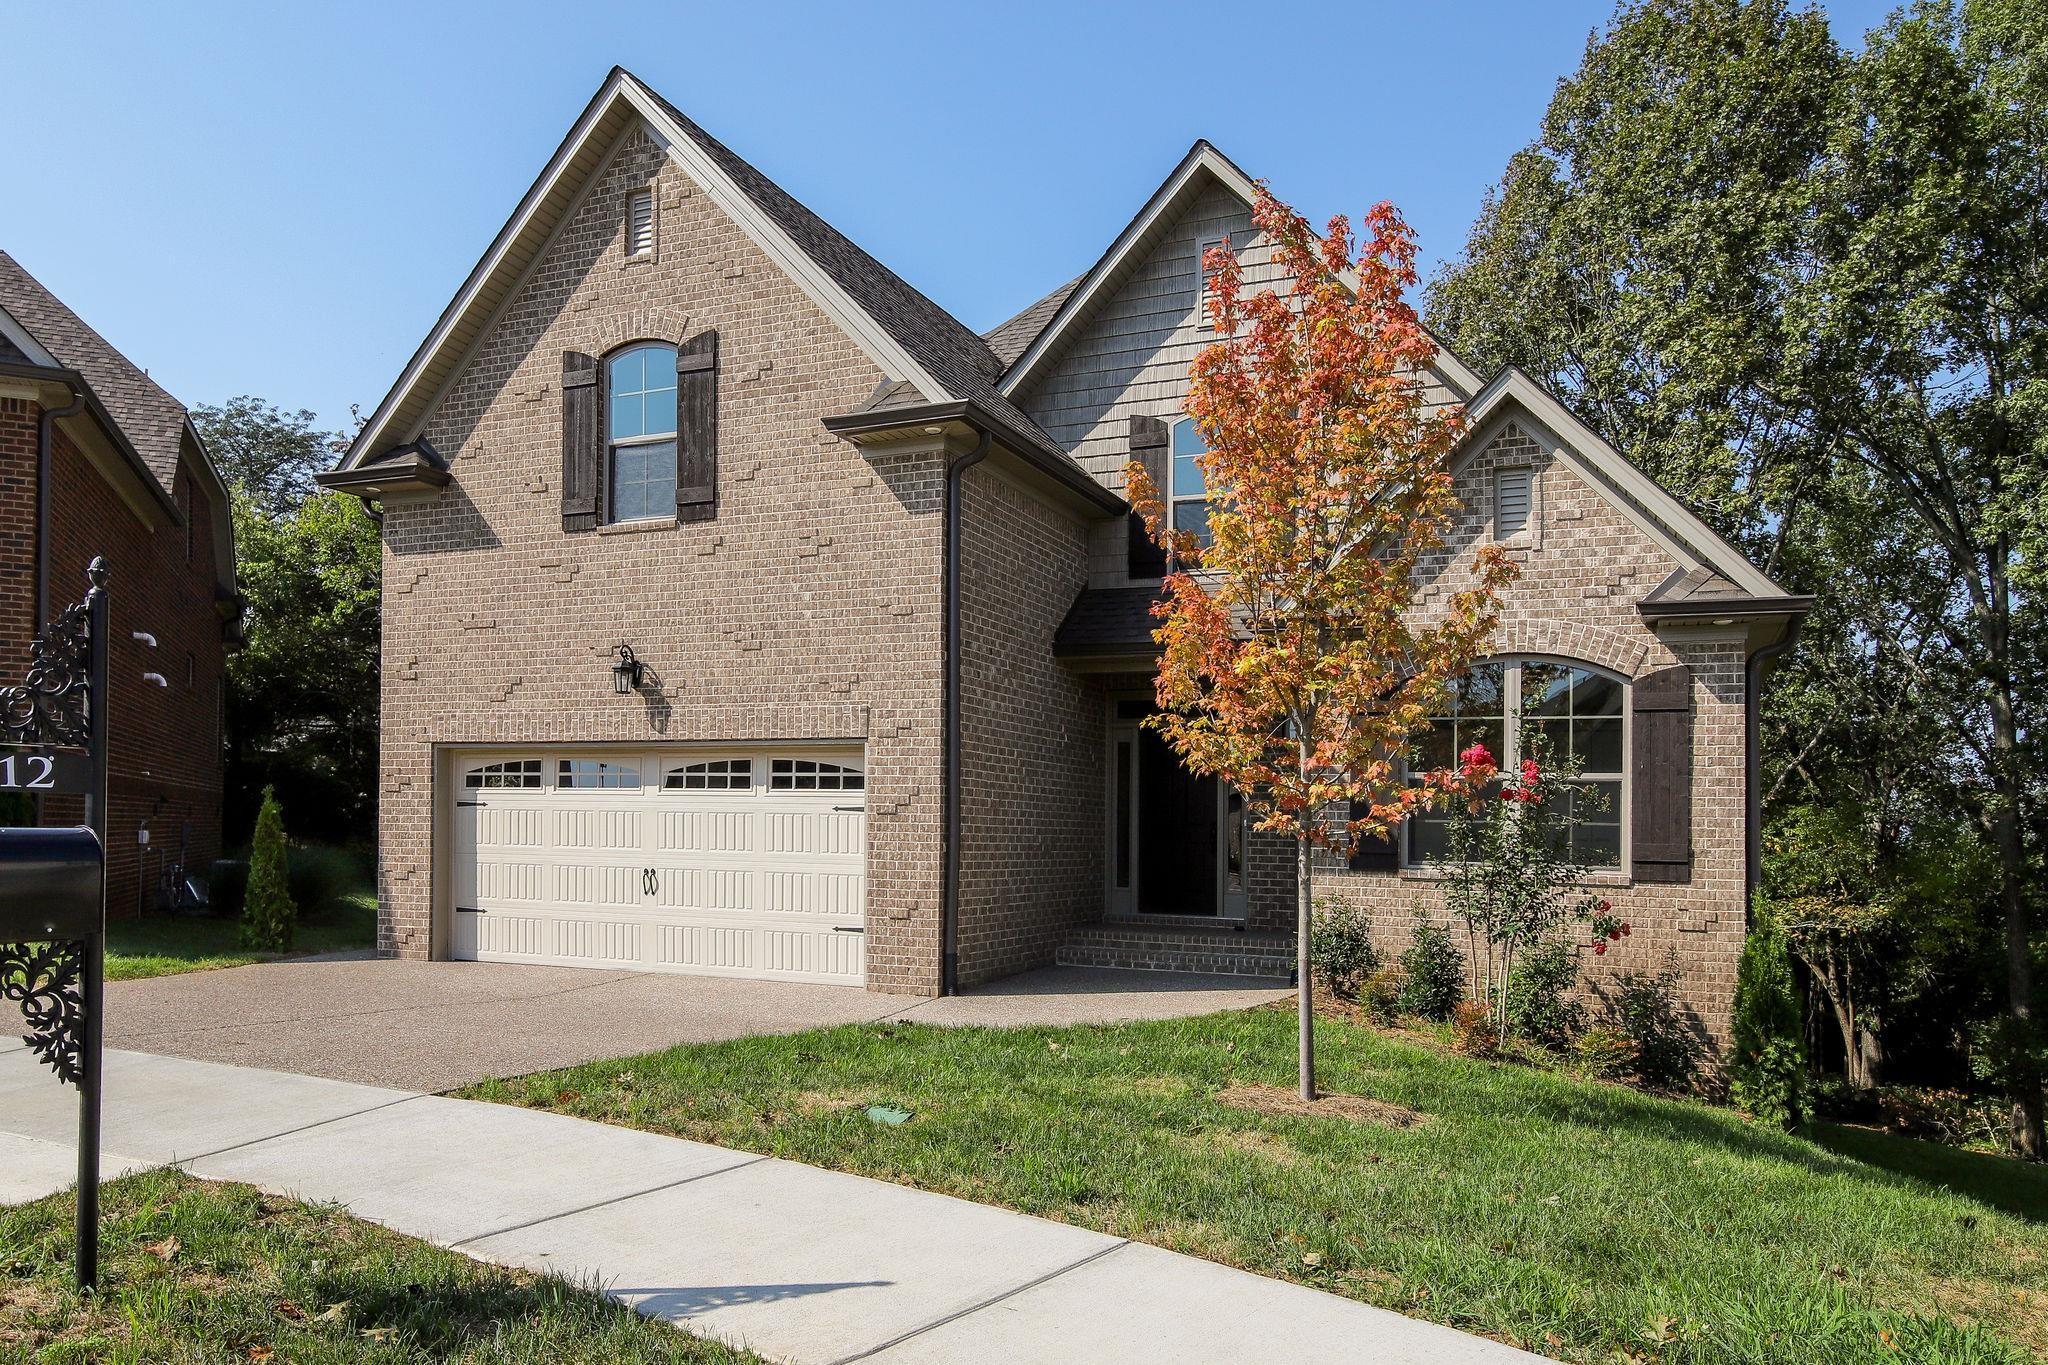 212 Lotus Ct, Hendersonville, TN 37075 - Hendersonville, TN real estate listing